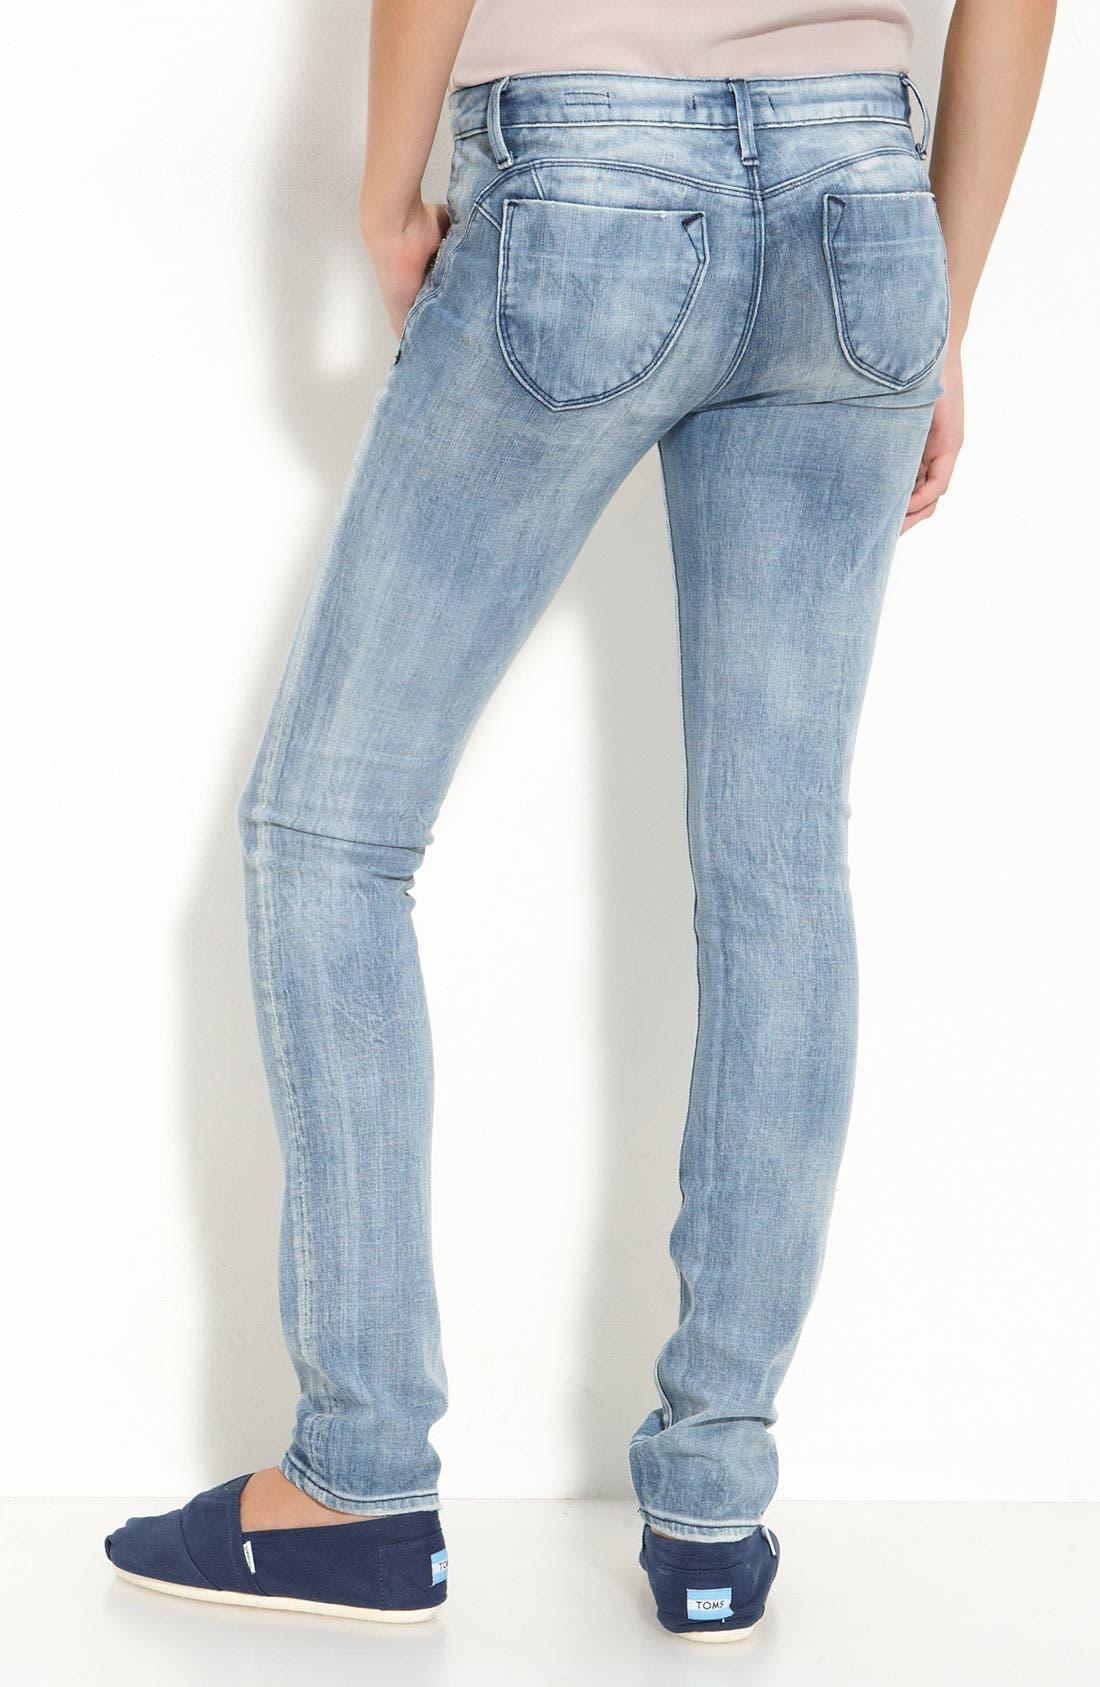 Alternate Image 1 Selected - Vigoss '88' Stretch Denim Skinny Jeans (Light Wash) (Juniors)